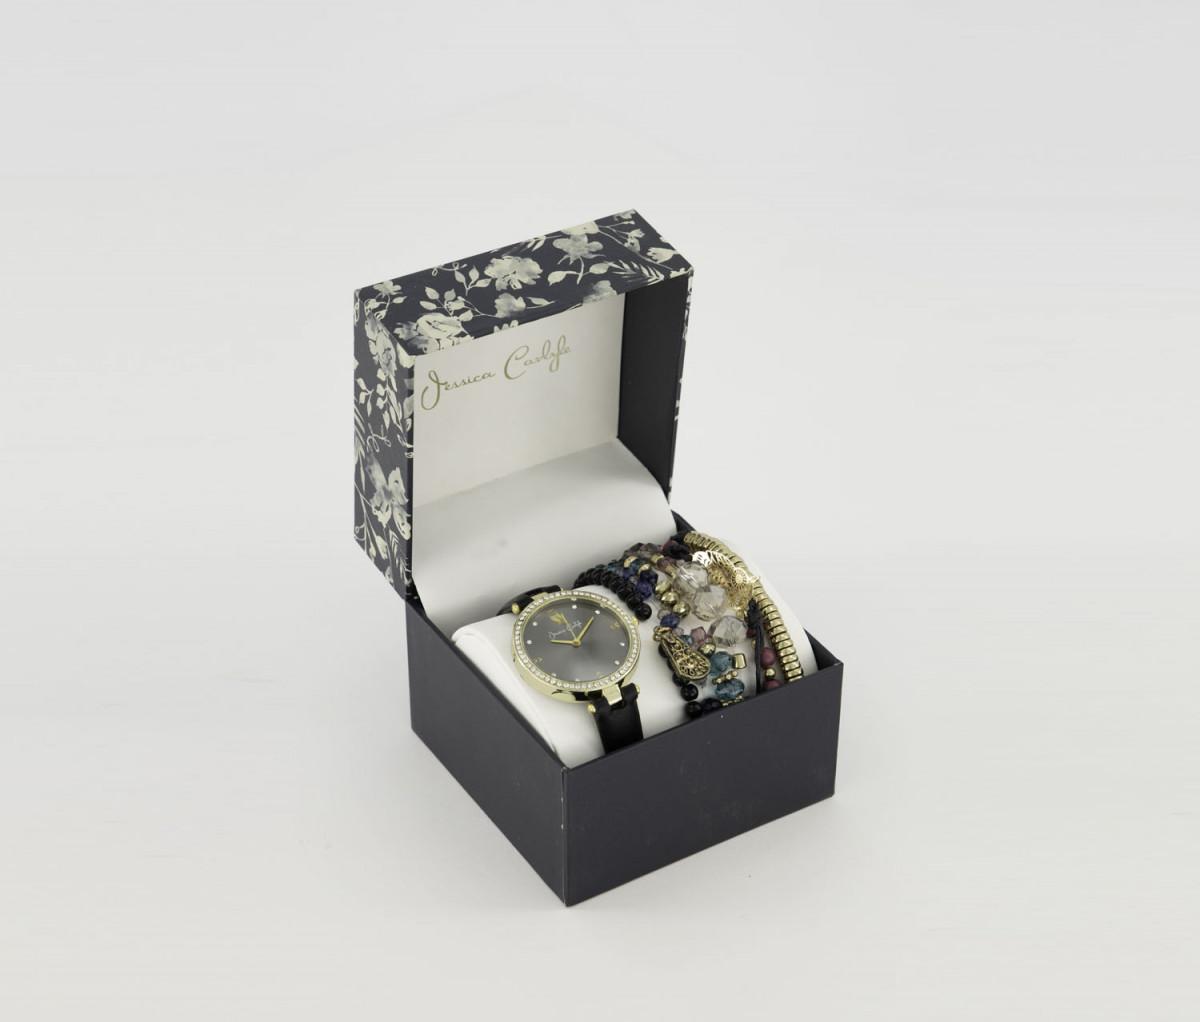 Jessica Carlyle Womens Analog Watch & Bracelet Set  Black/Gold